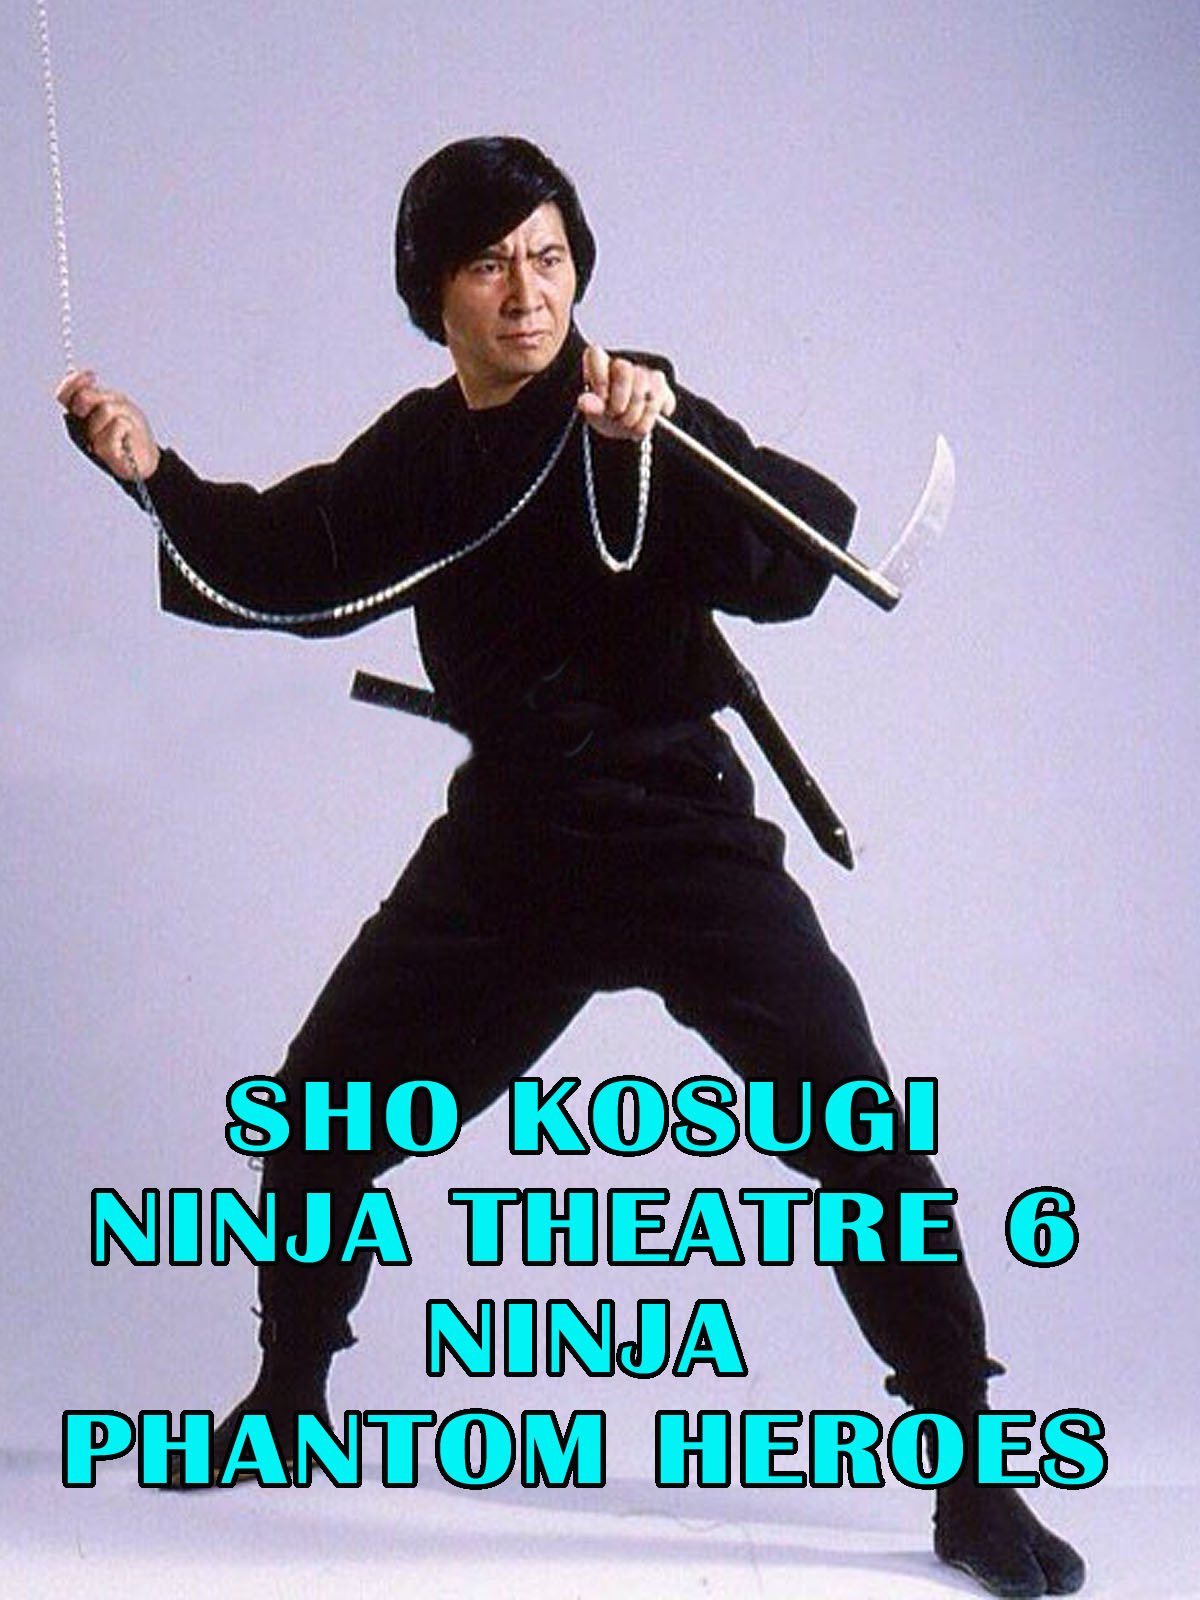 Sho Kosugi Ninja Theater Vol.6 Ninja Phantom Heroes on Amazon Prime Video UK